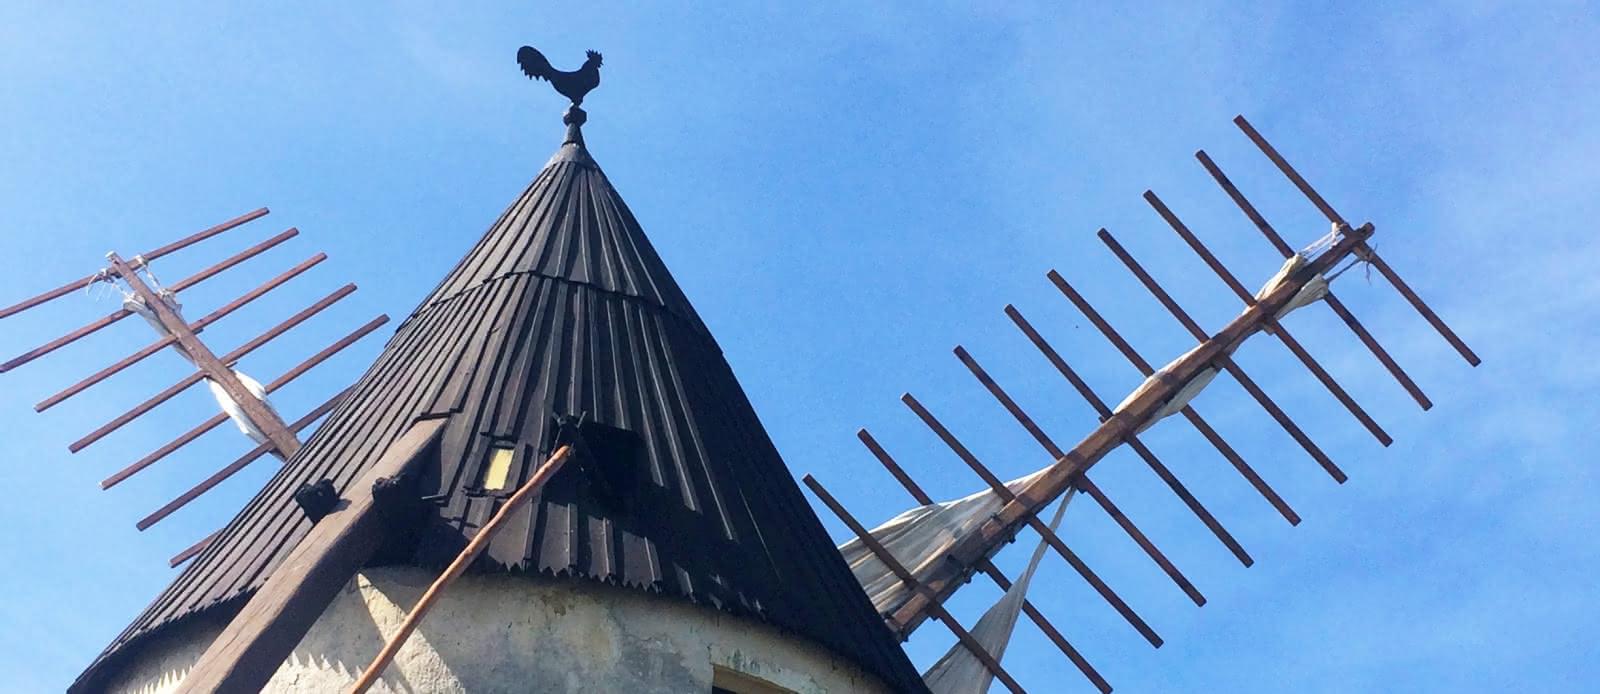 Moulin de Vensac - © Médoc Atlantique (1)